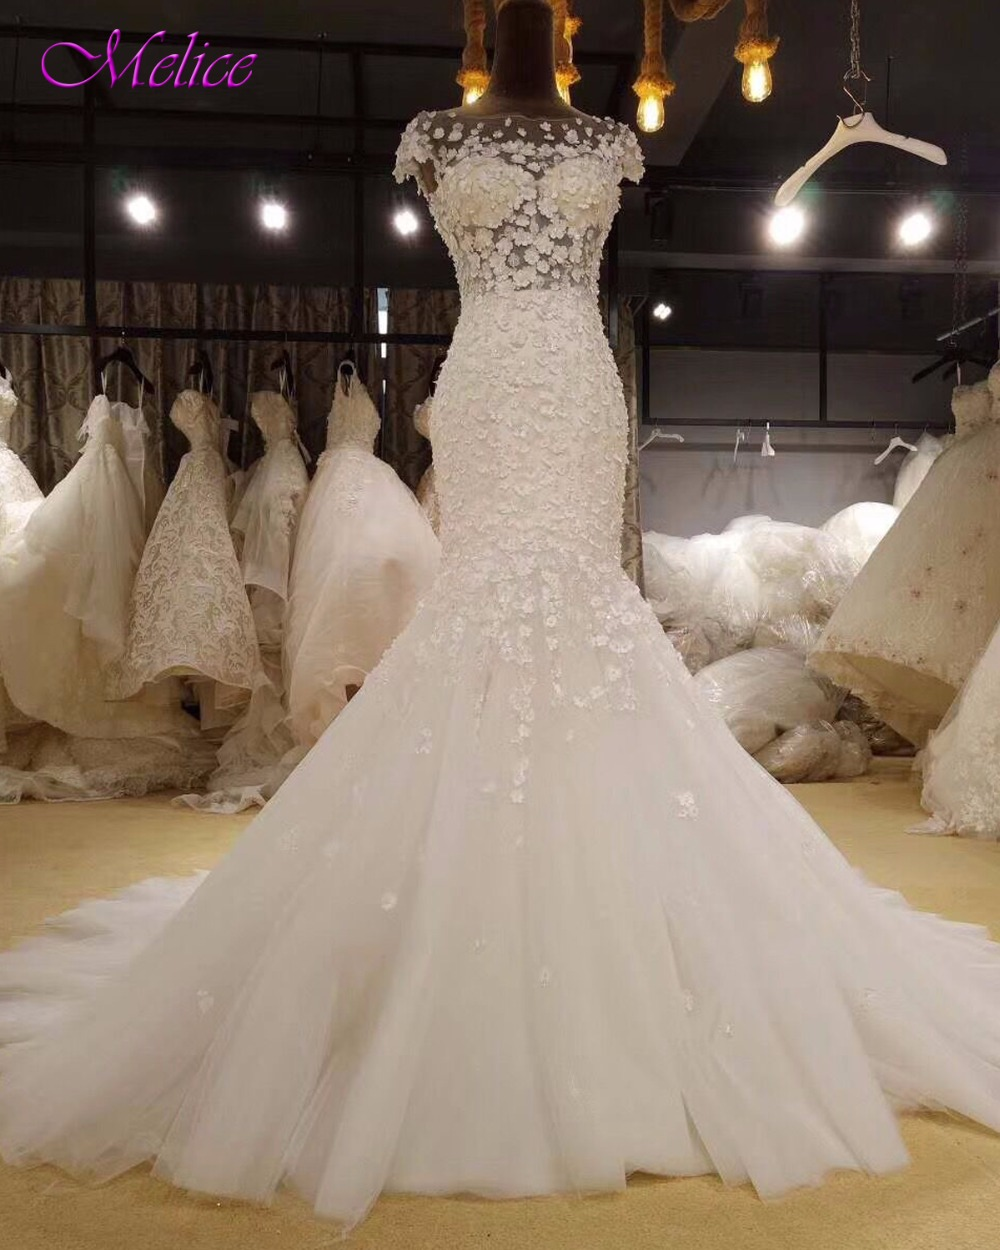 aliexpress robe de mariée - 60% remise -